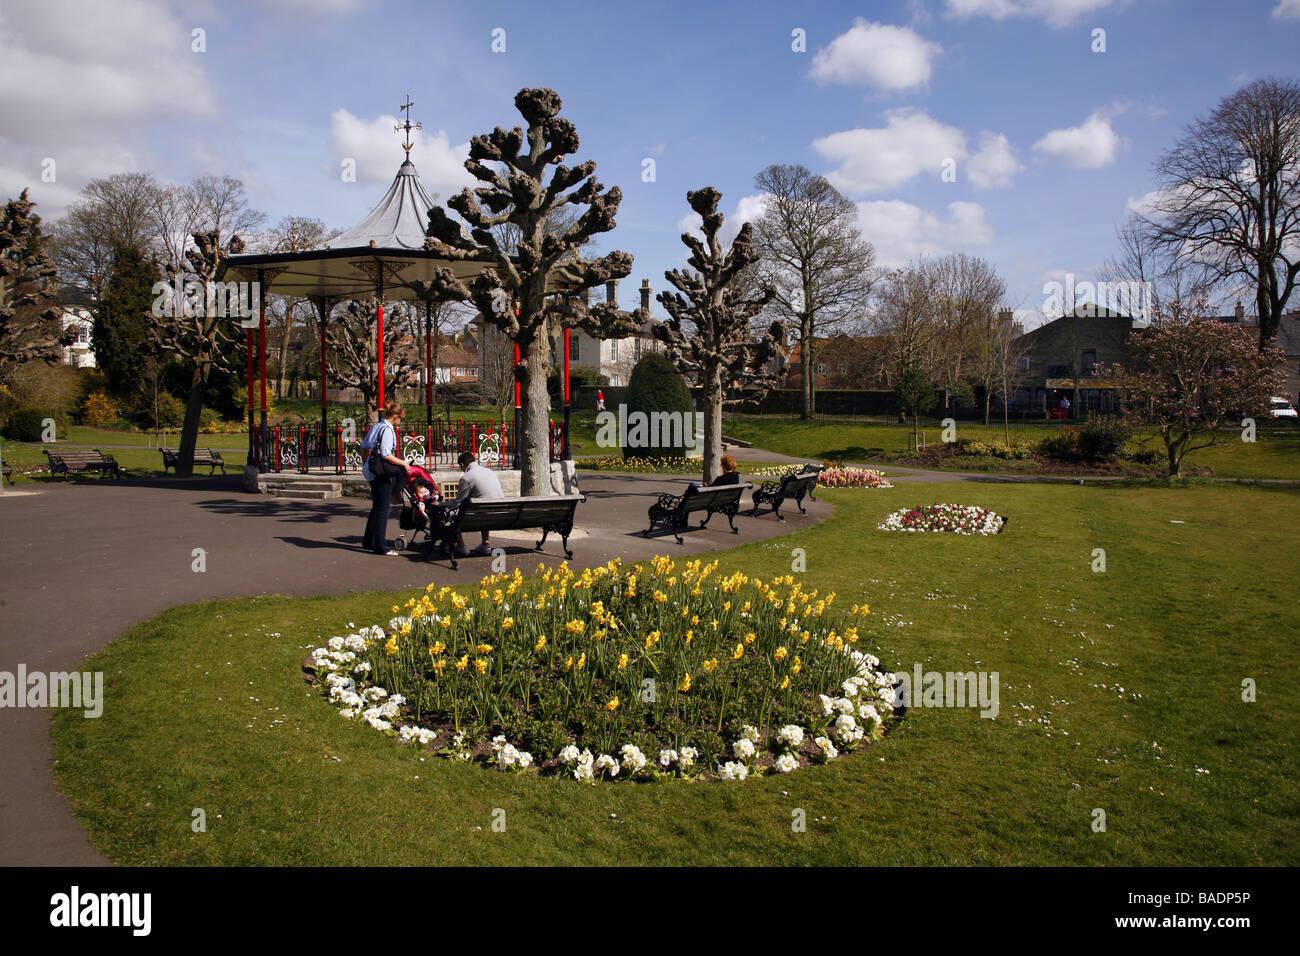 Borough Gardens Stock Photos & Borough Gardens Stock Images - Alamy